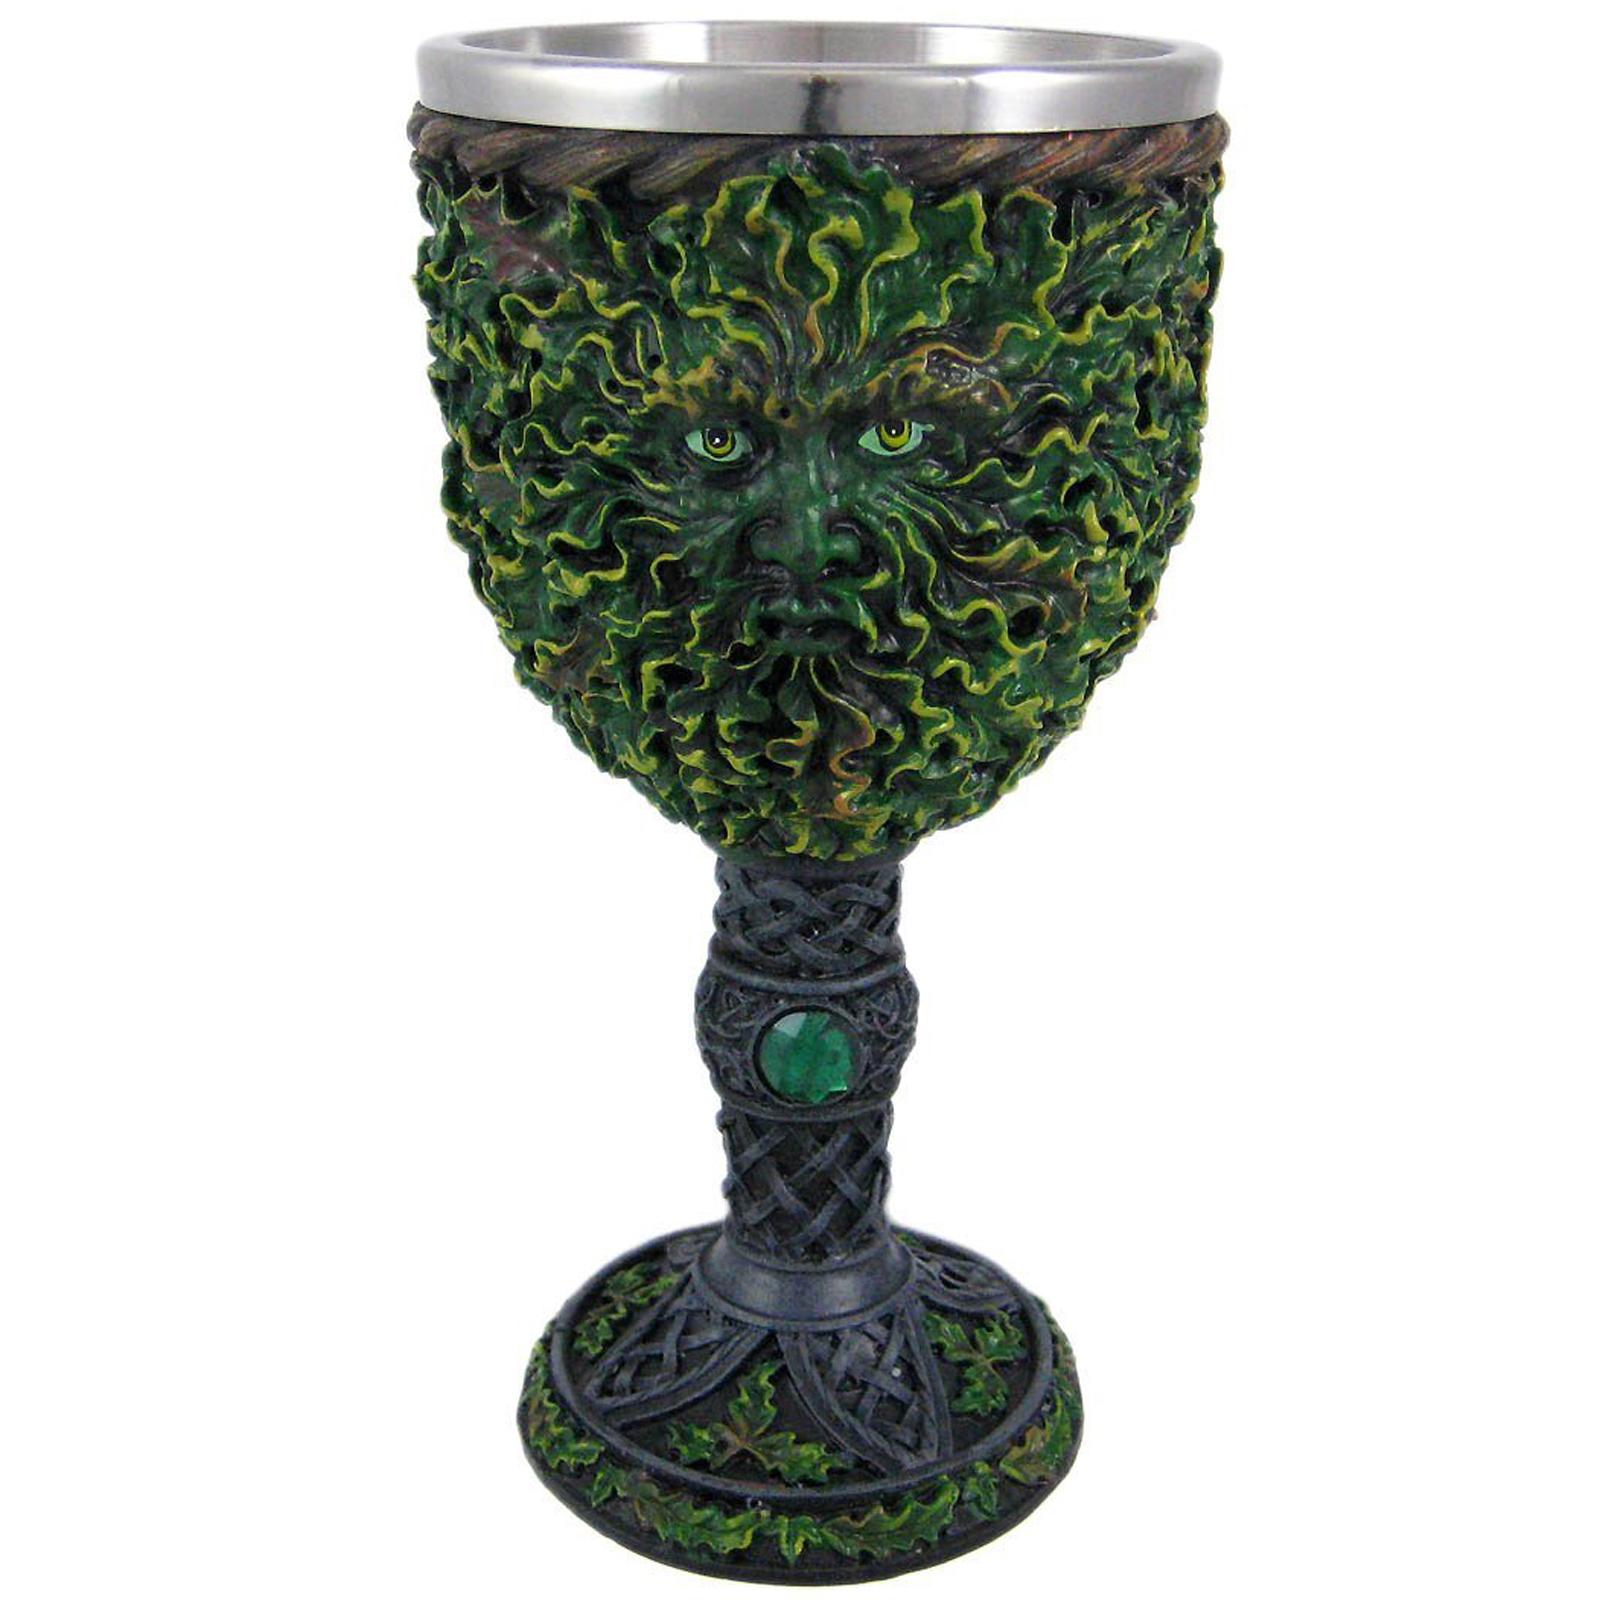 Greenman tree medieval renaissance wine goblet green gemstone celtic chalice cup ebay - Plastic medieval goblets ...